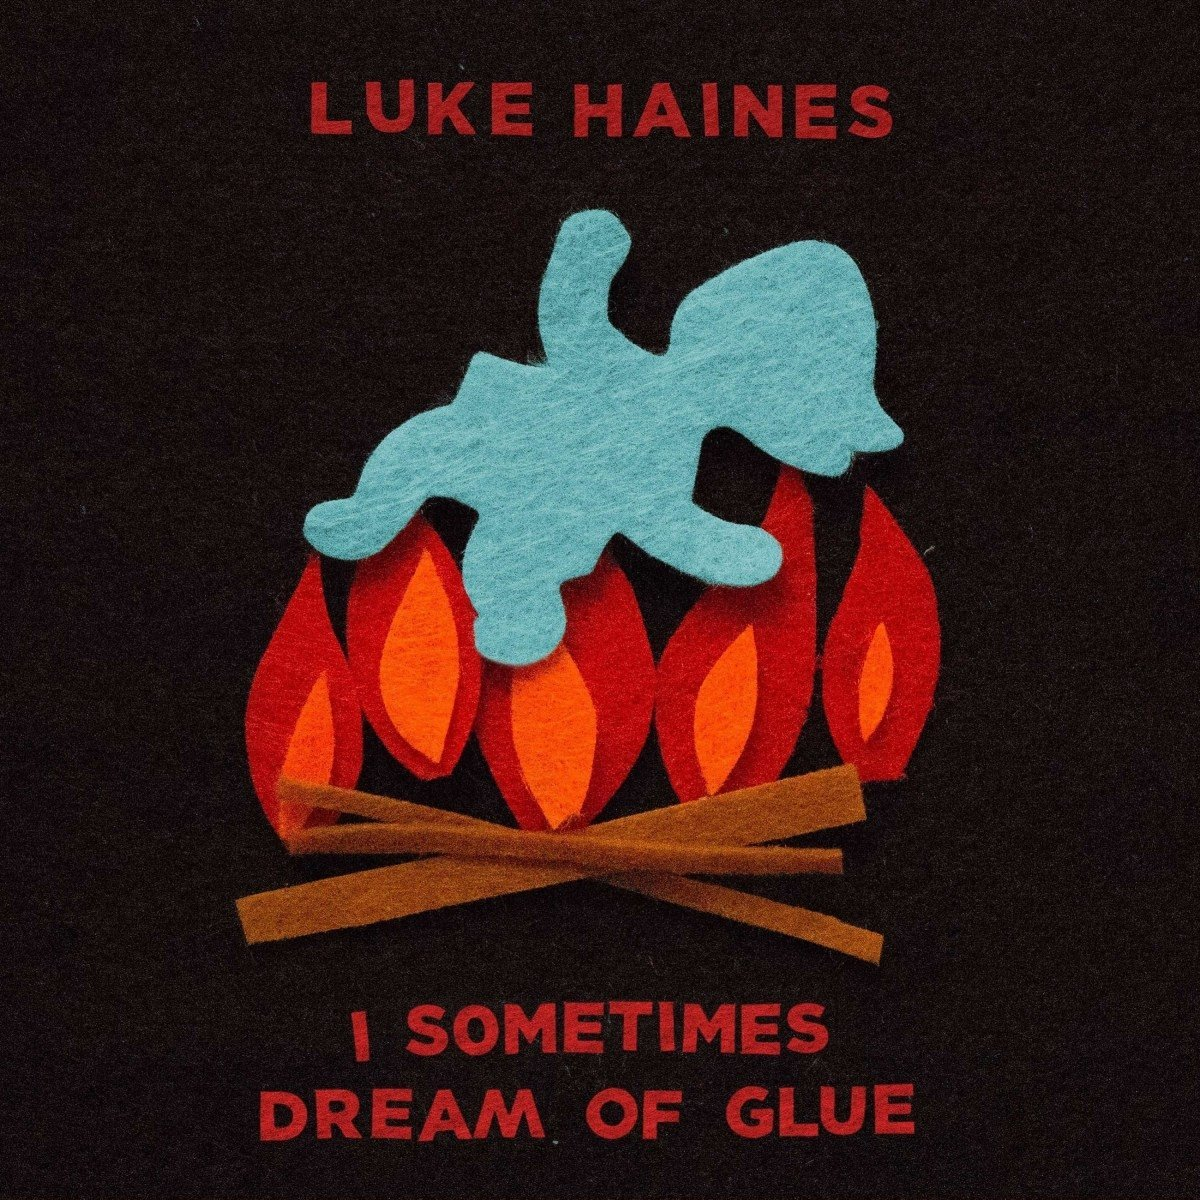 Luke Haines – I Sometimes Dream Of Glue (Cherry Red)